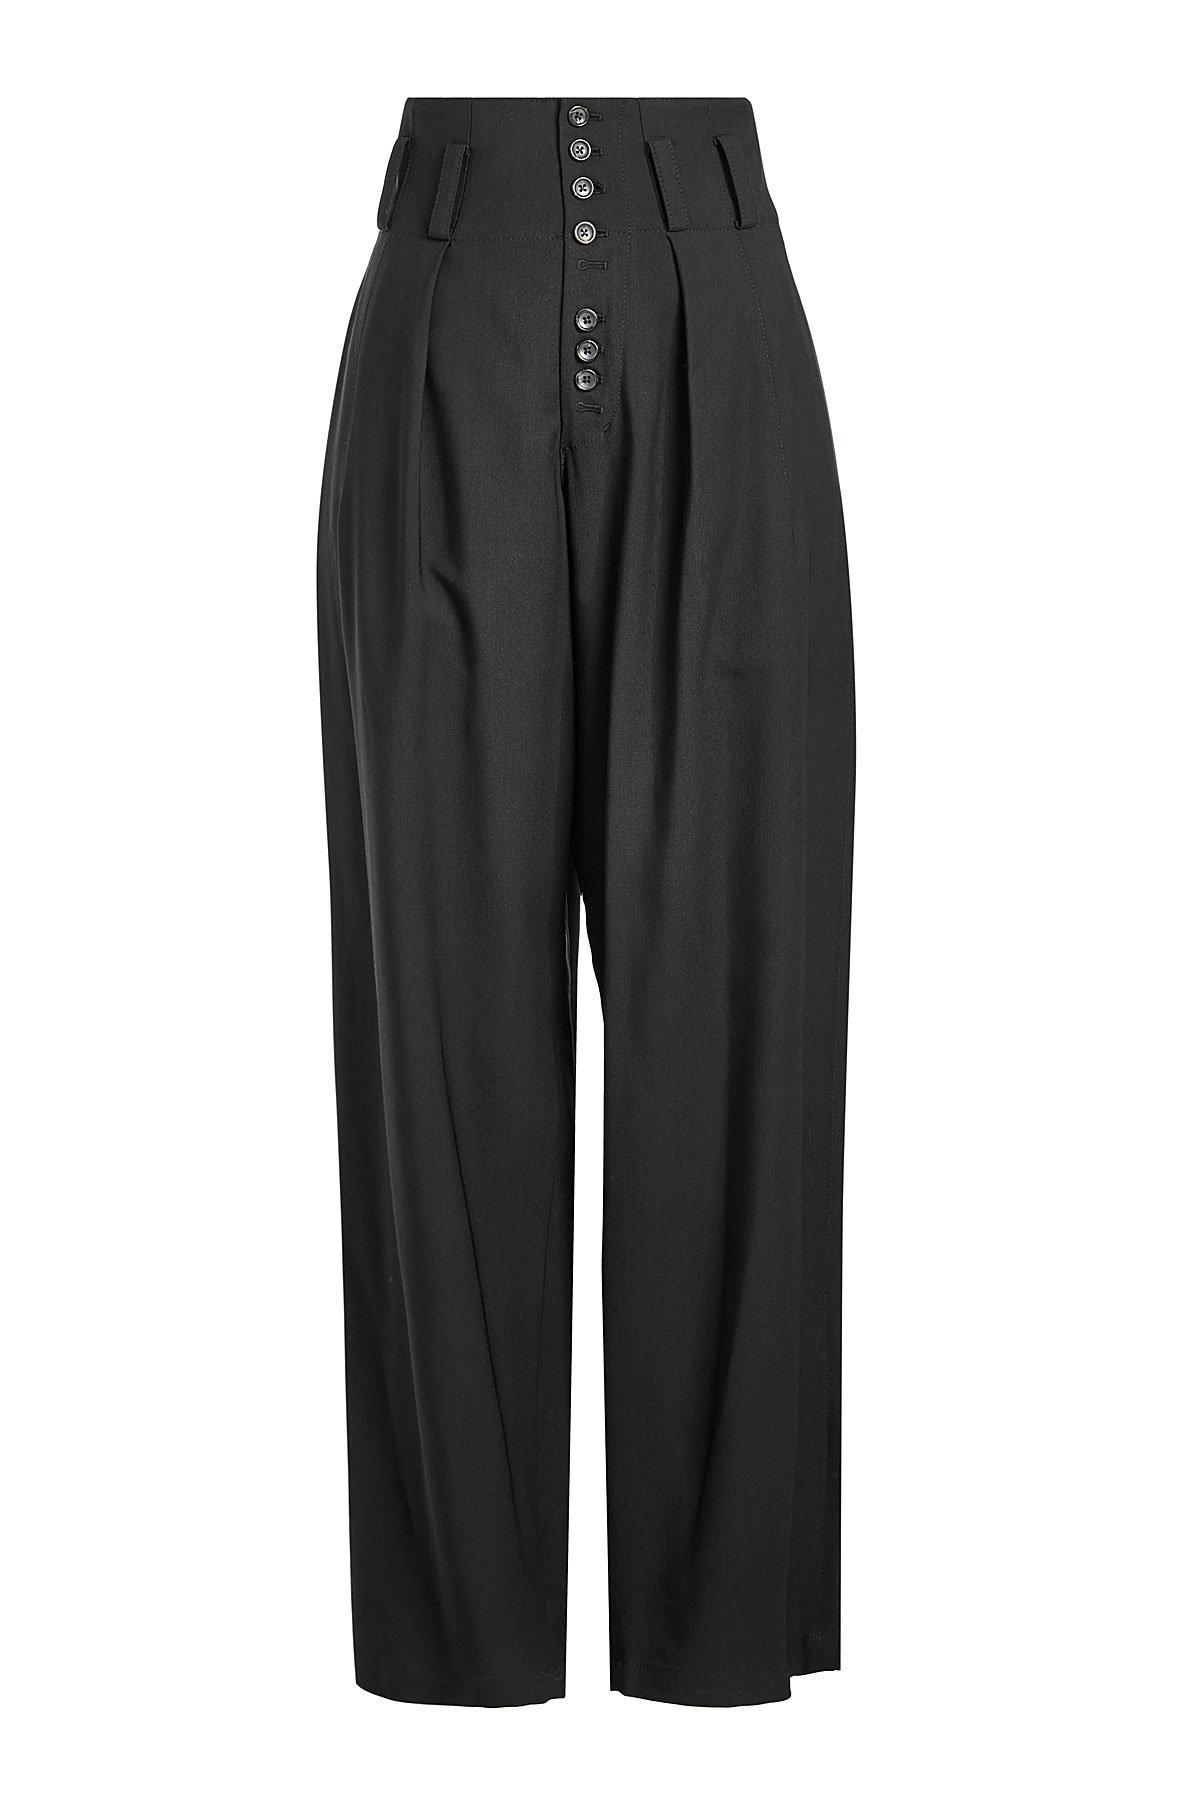 Joseph High-waist Pants In Black